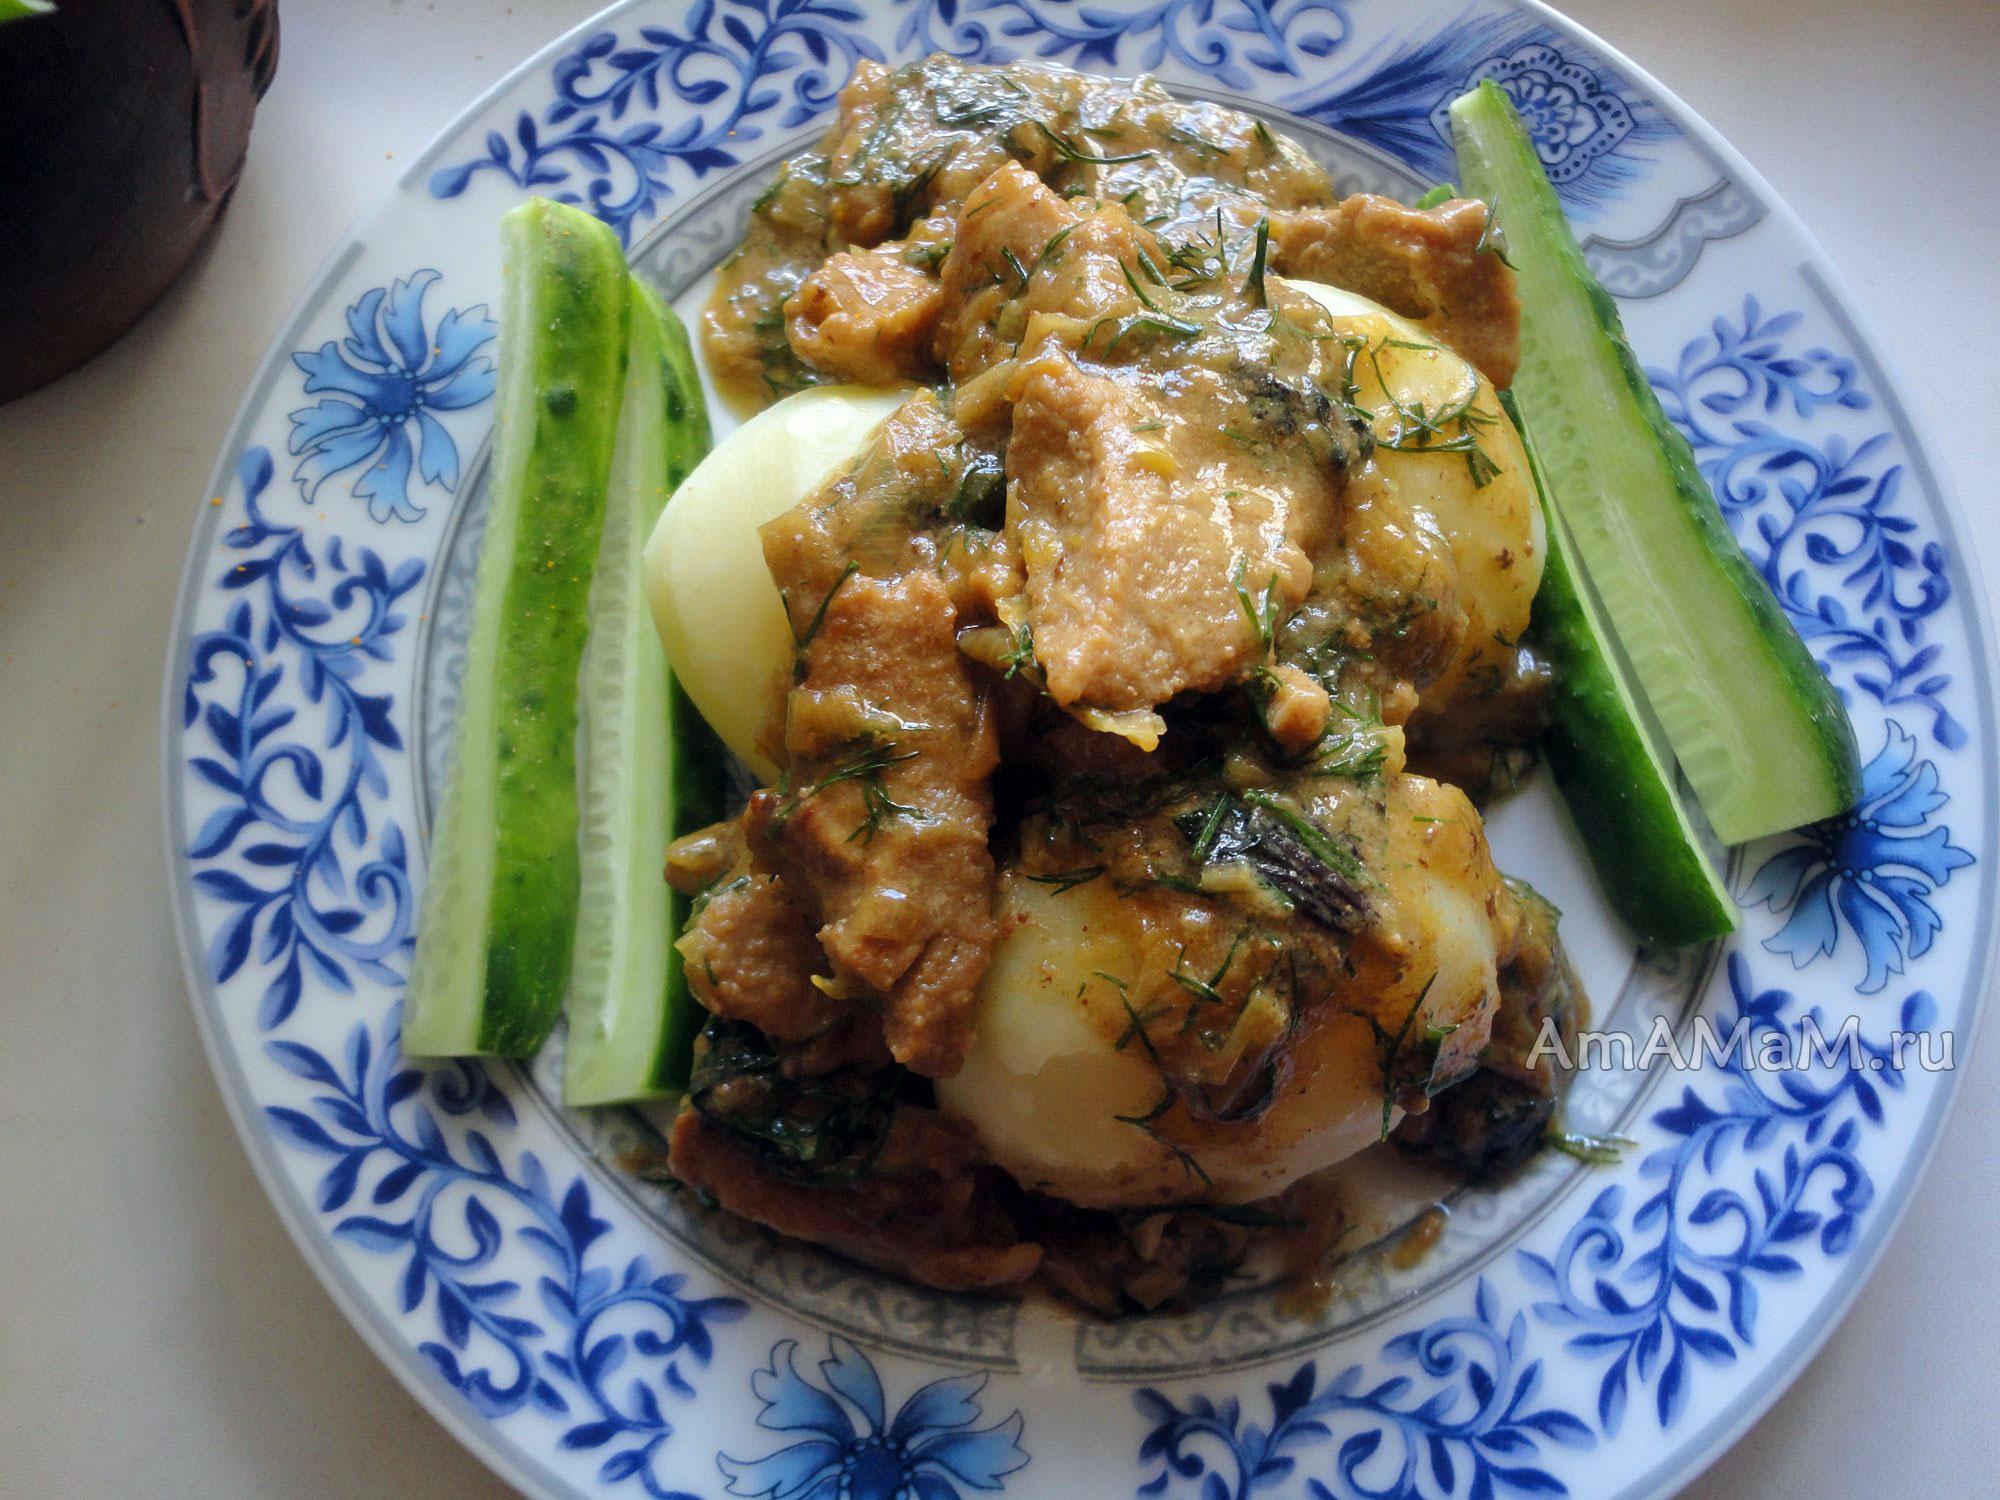 Рецепт картошки в заливке